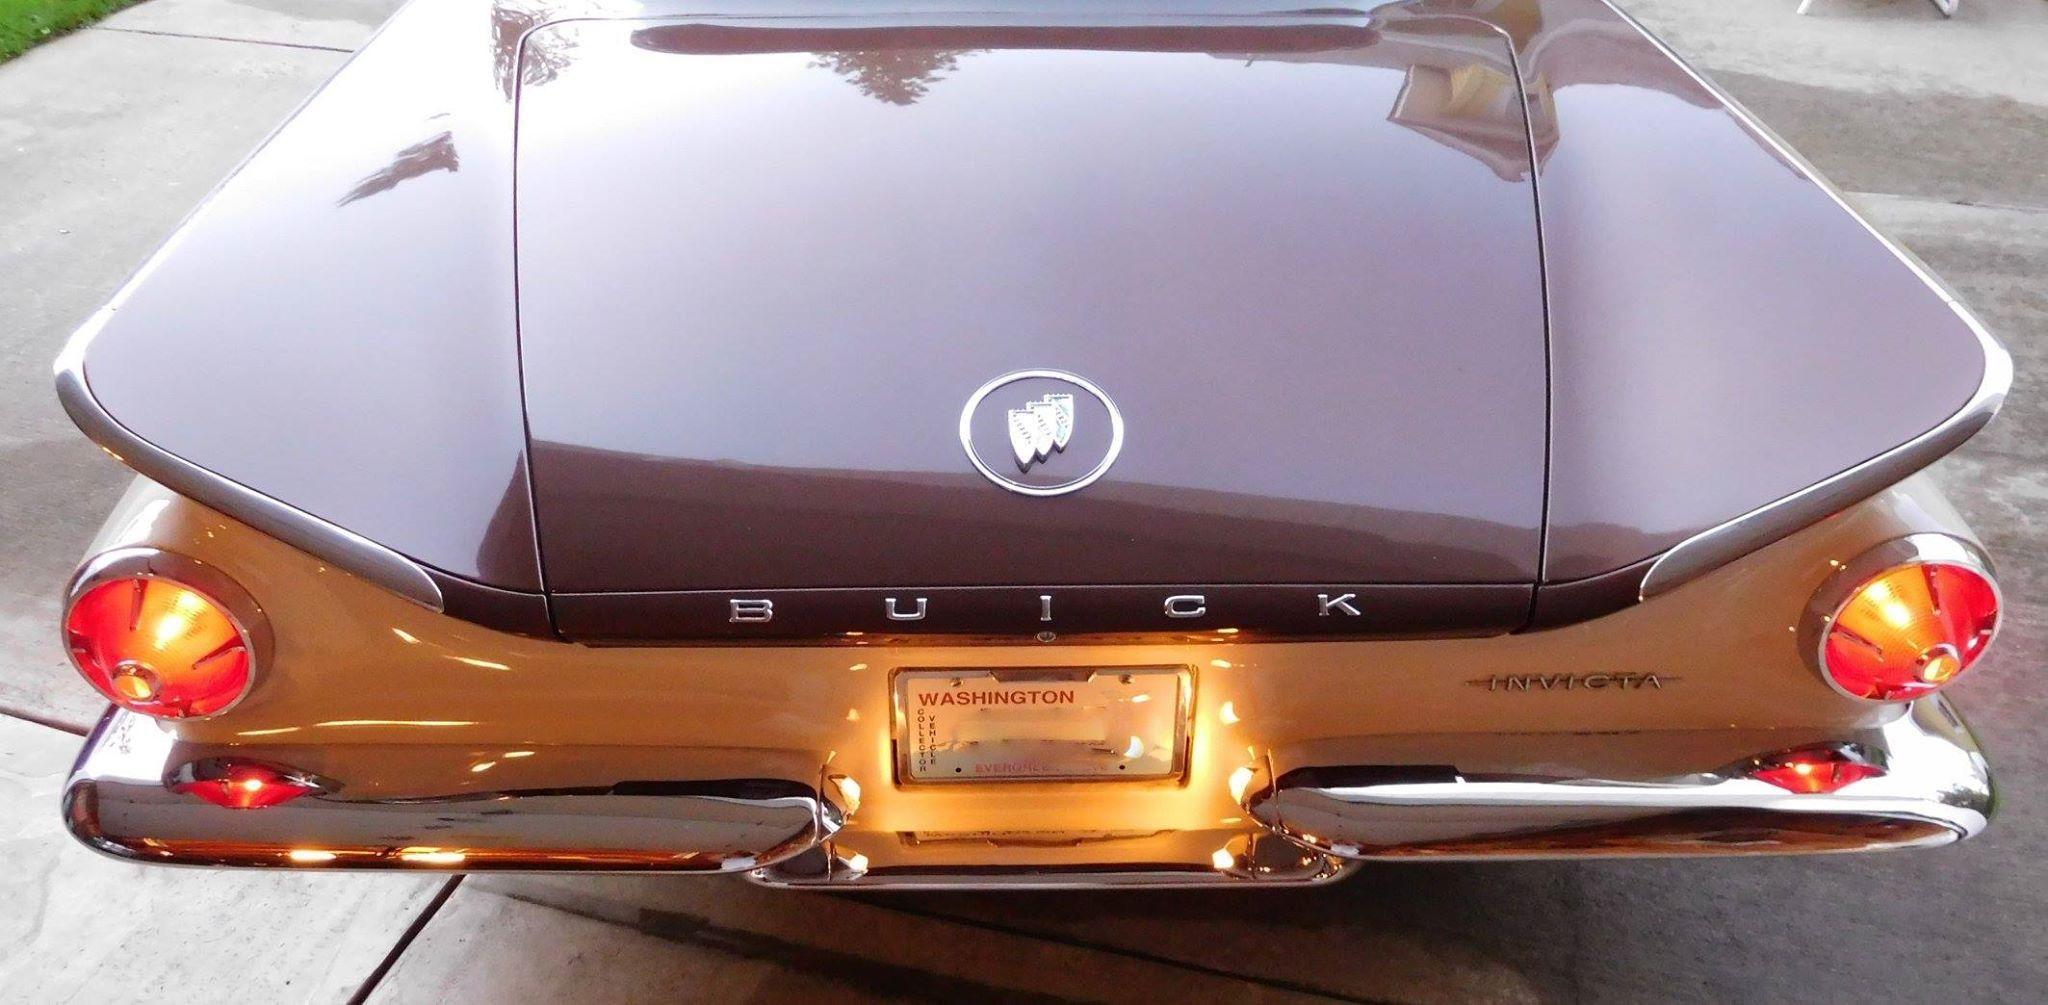 pingl par alain ward sur collector car buick classic cars et cars. Black Bedroom Furniture Sets. Home Design Ideas